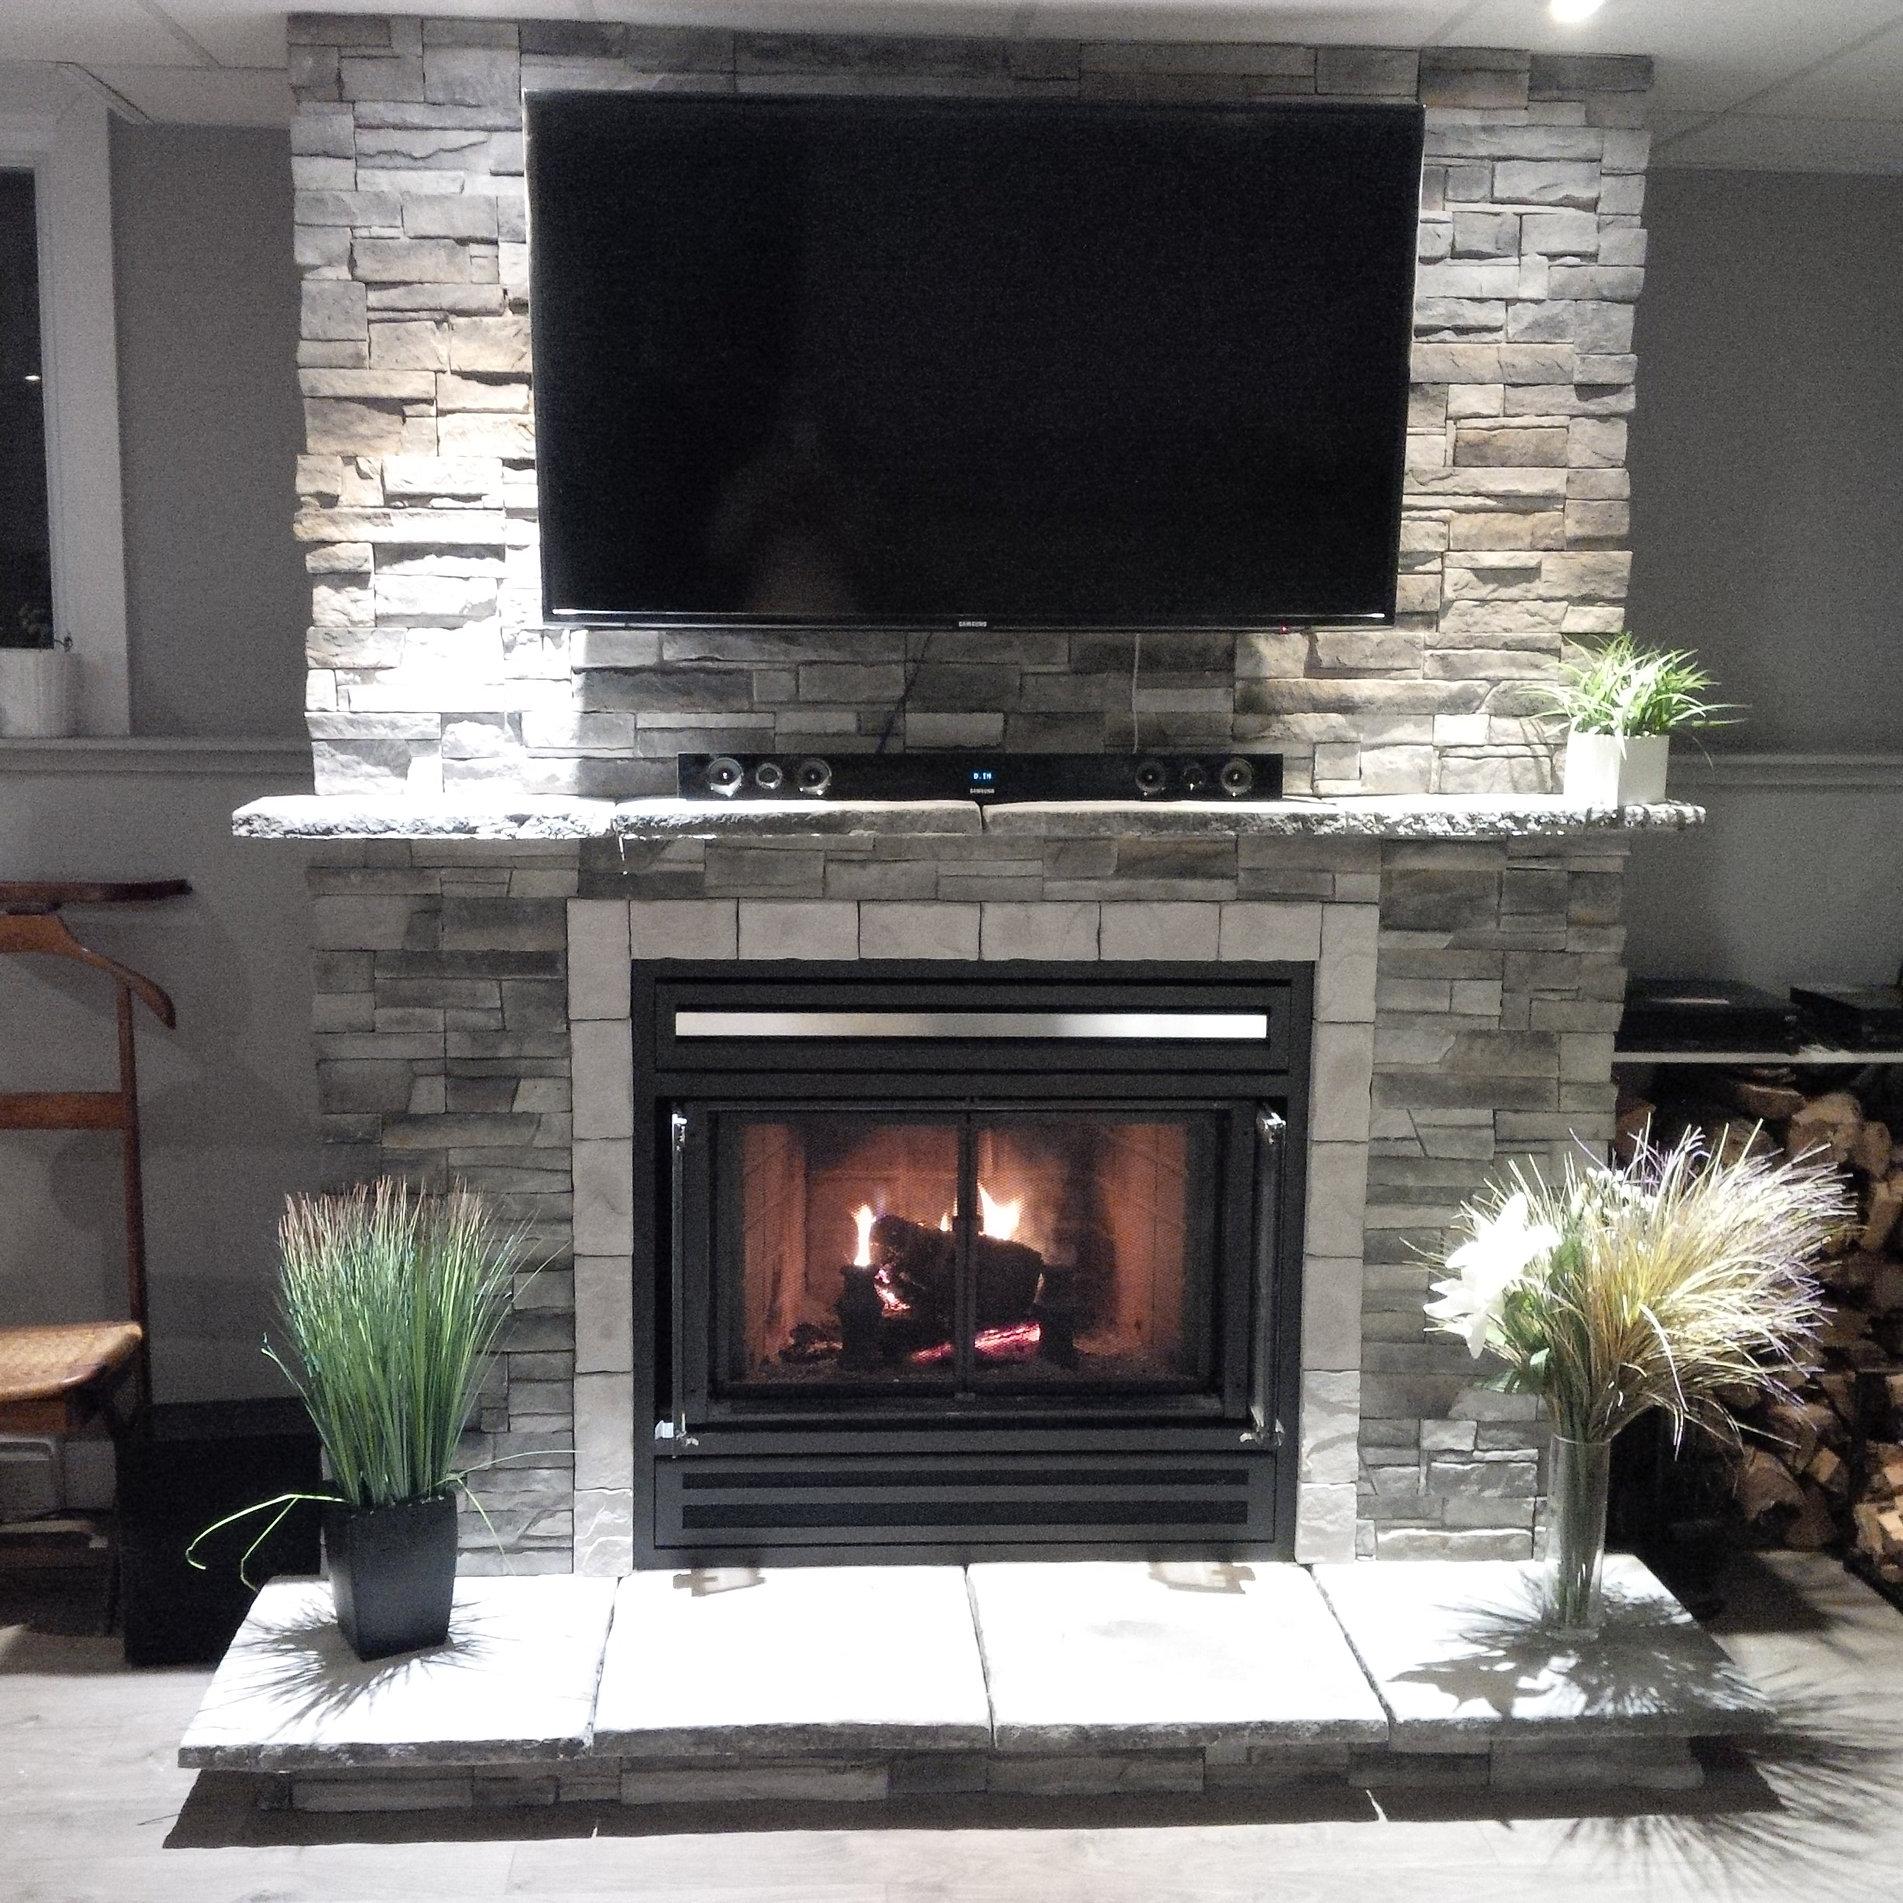 kit de pierres foyer ottawa gatineau fireplace aylmer